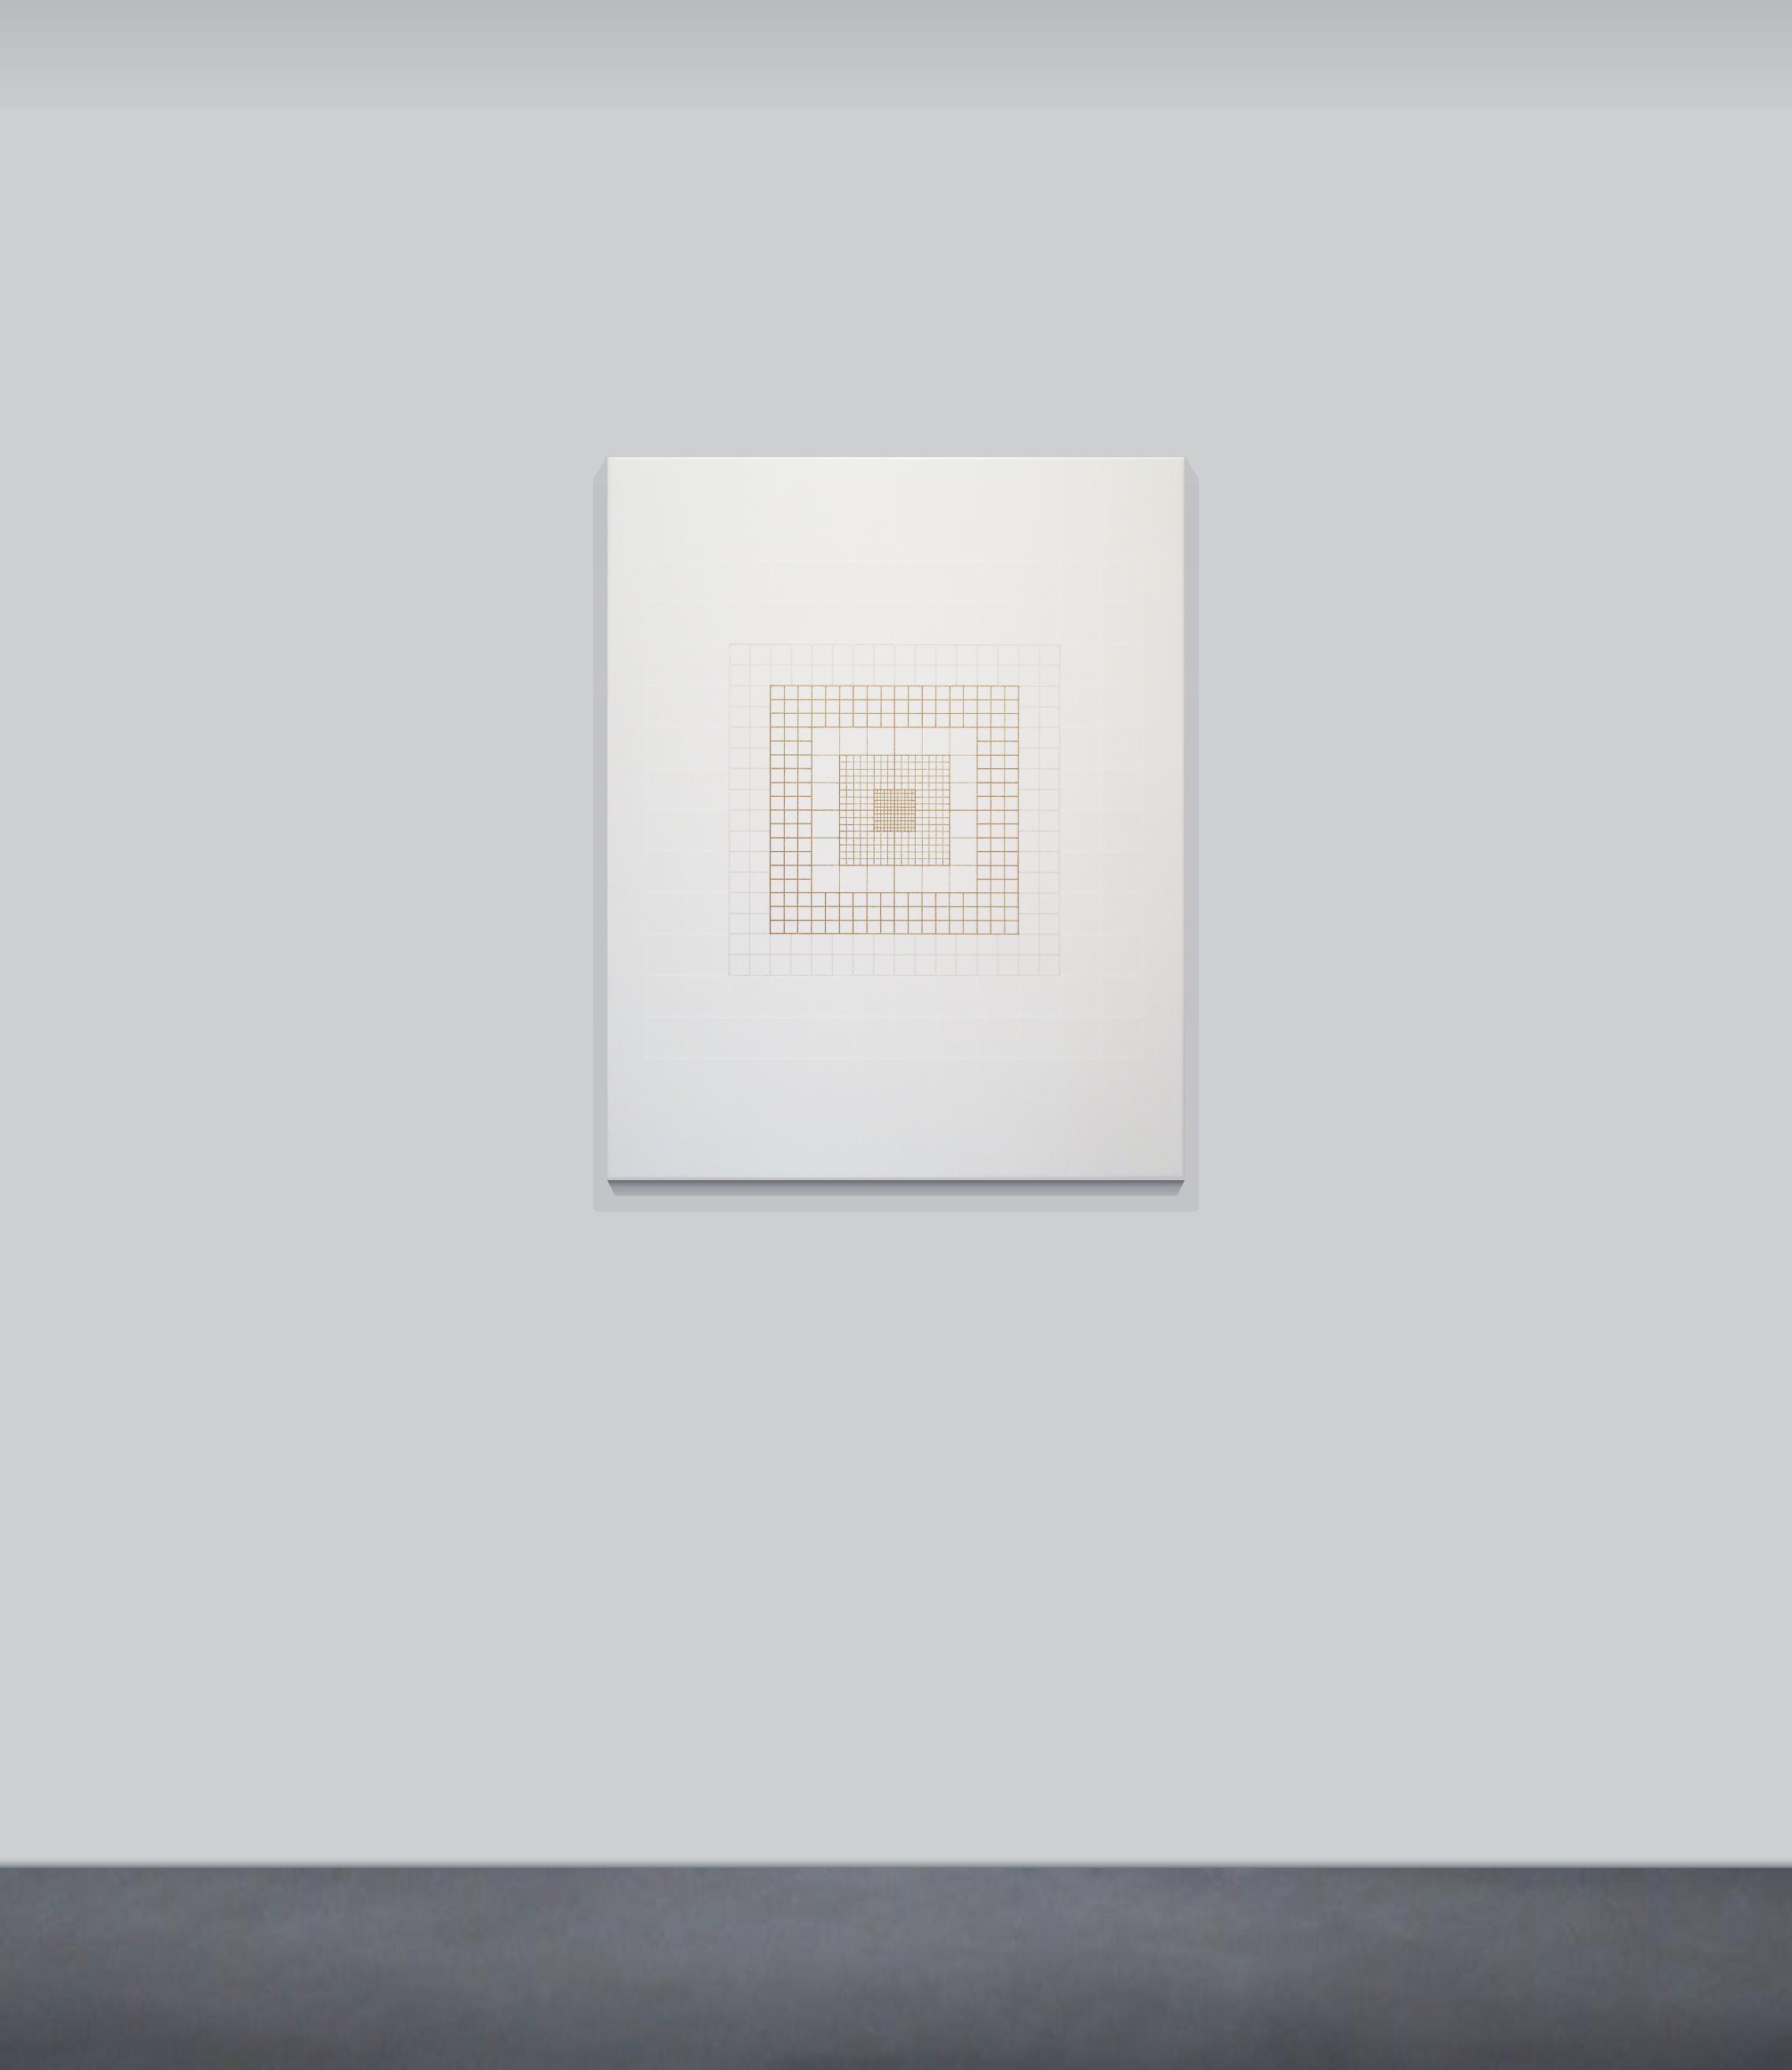 Yantra-origo-metrum-[20180512]_grey-wall-2.png